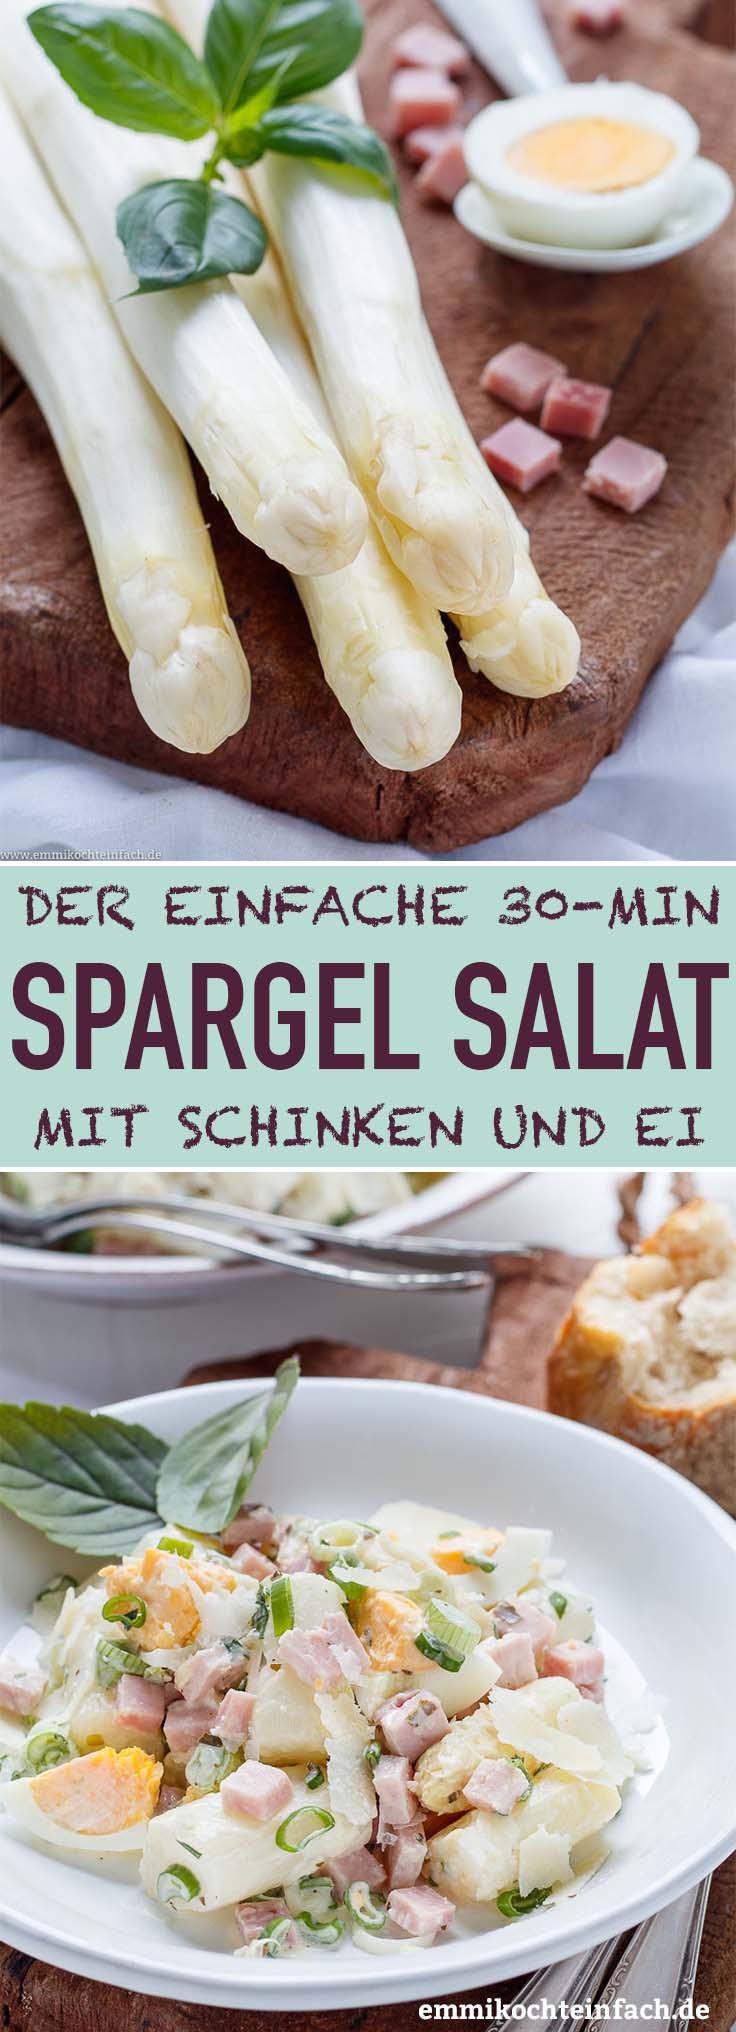 Leckerer Spargelsalat in nur 30 Minuten - www.emmikochteinfach.de